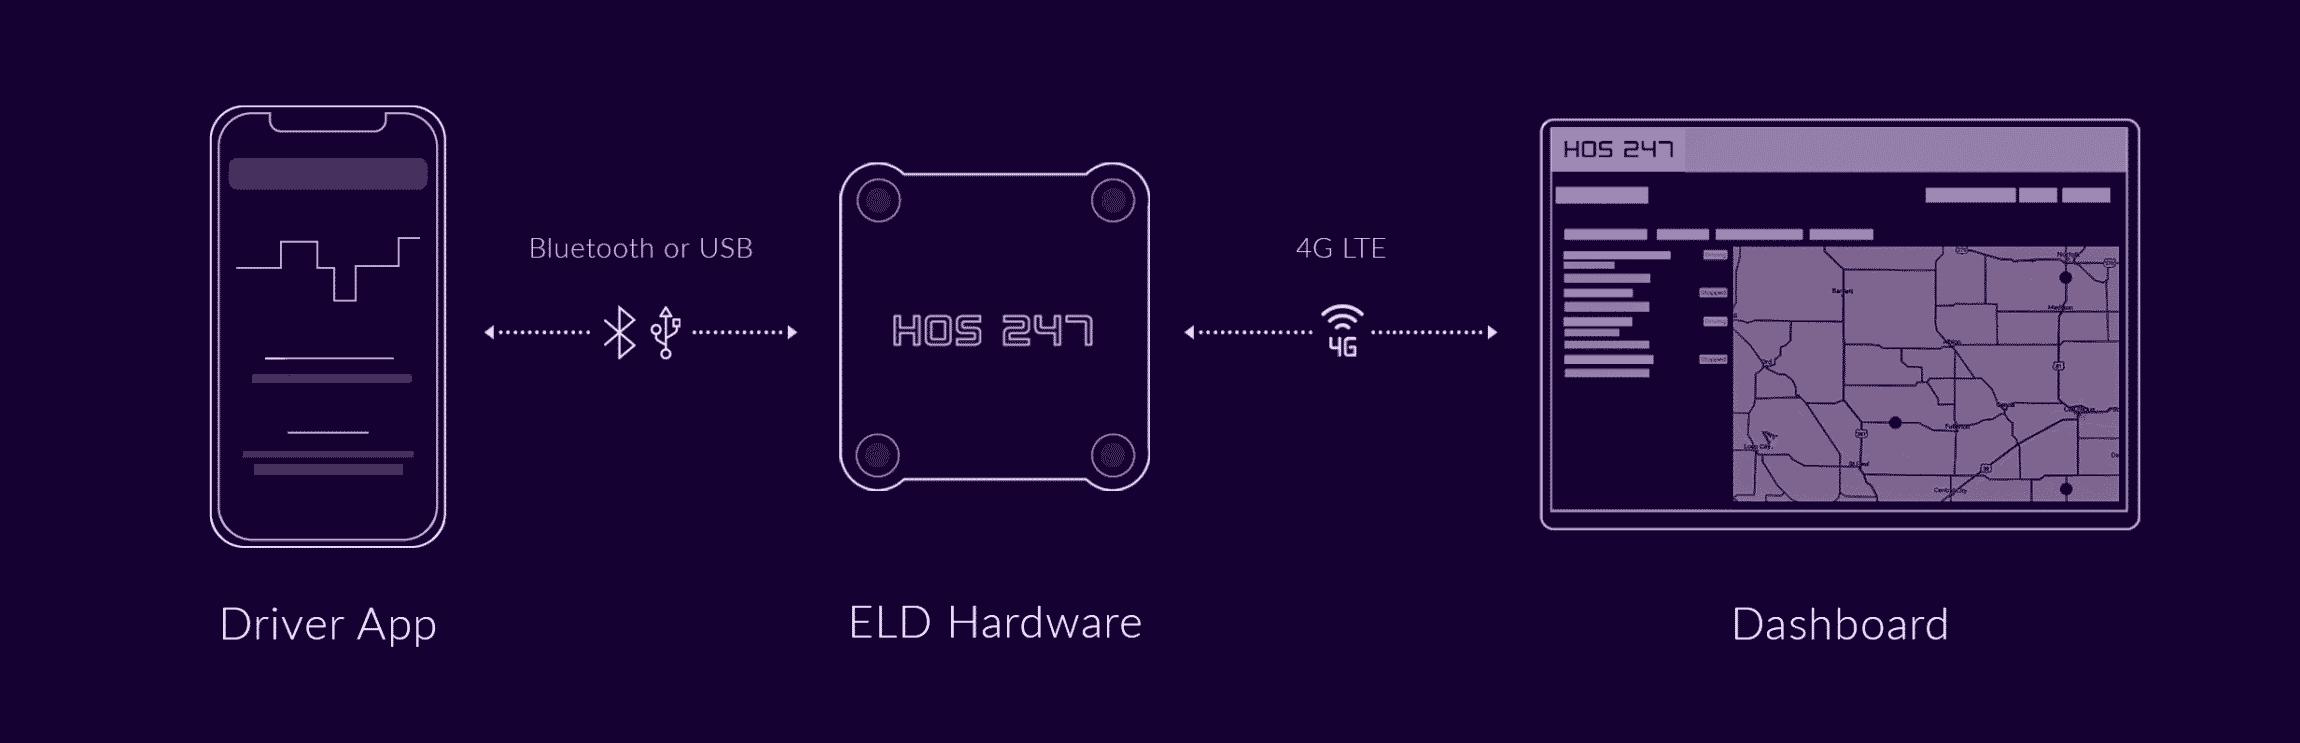 HOS247 eld connection pic